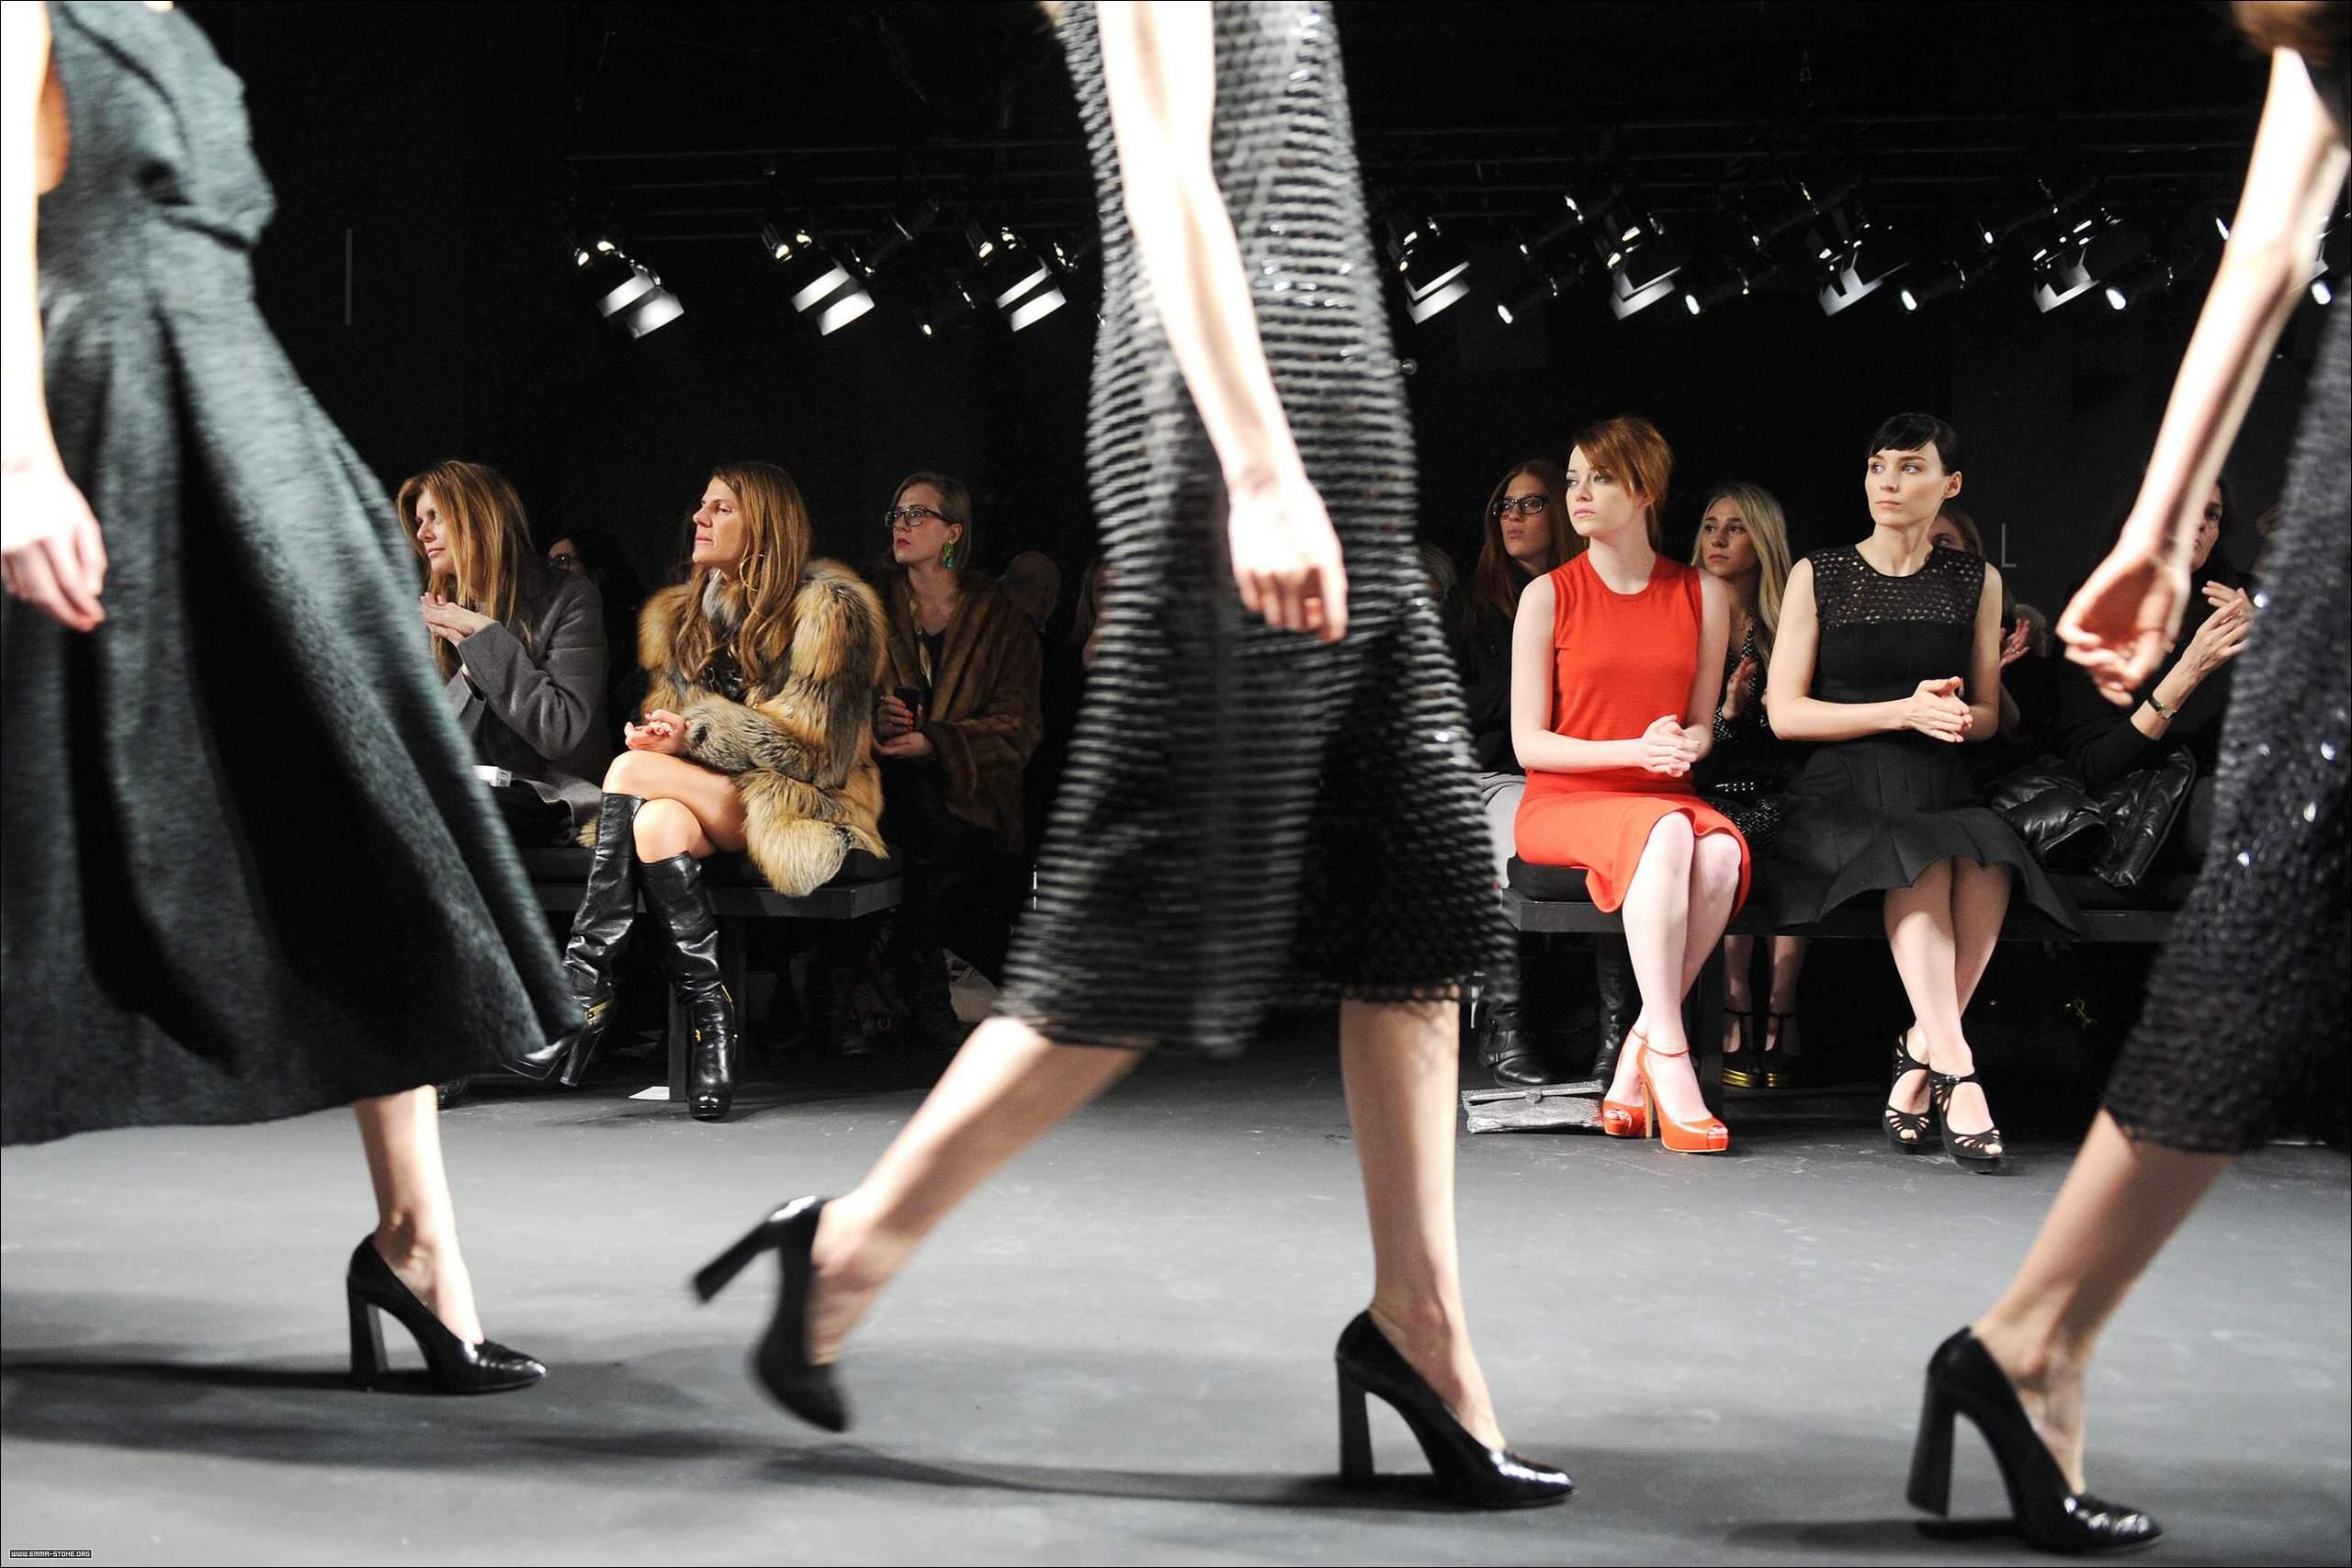 Mercedes-Benz-Fashion-Week-Fall-2012-Calvin-Klein-Collection-emma-stone-29364317-2560-1707